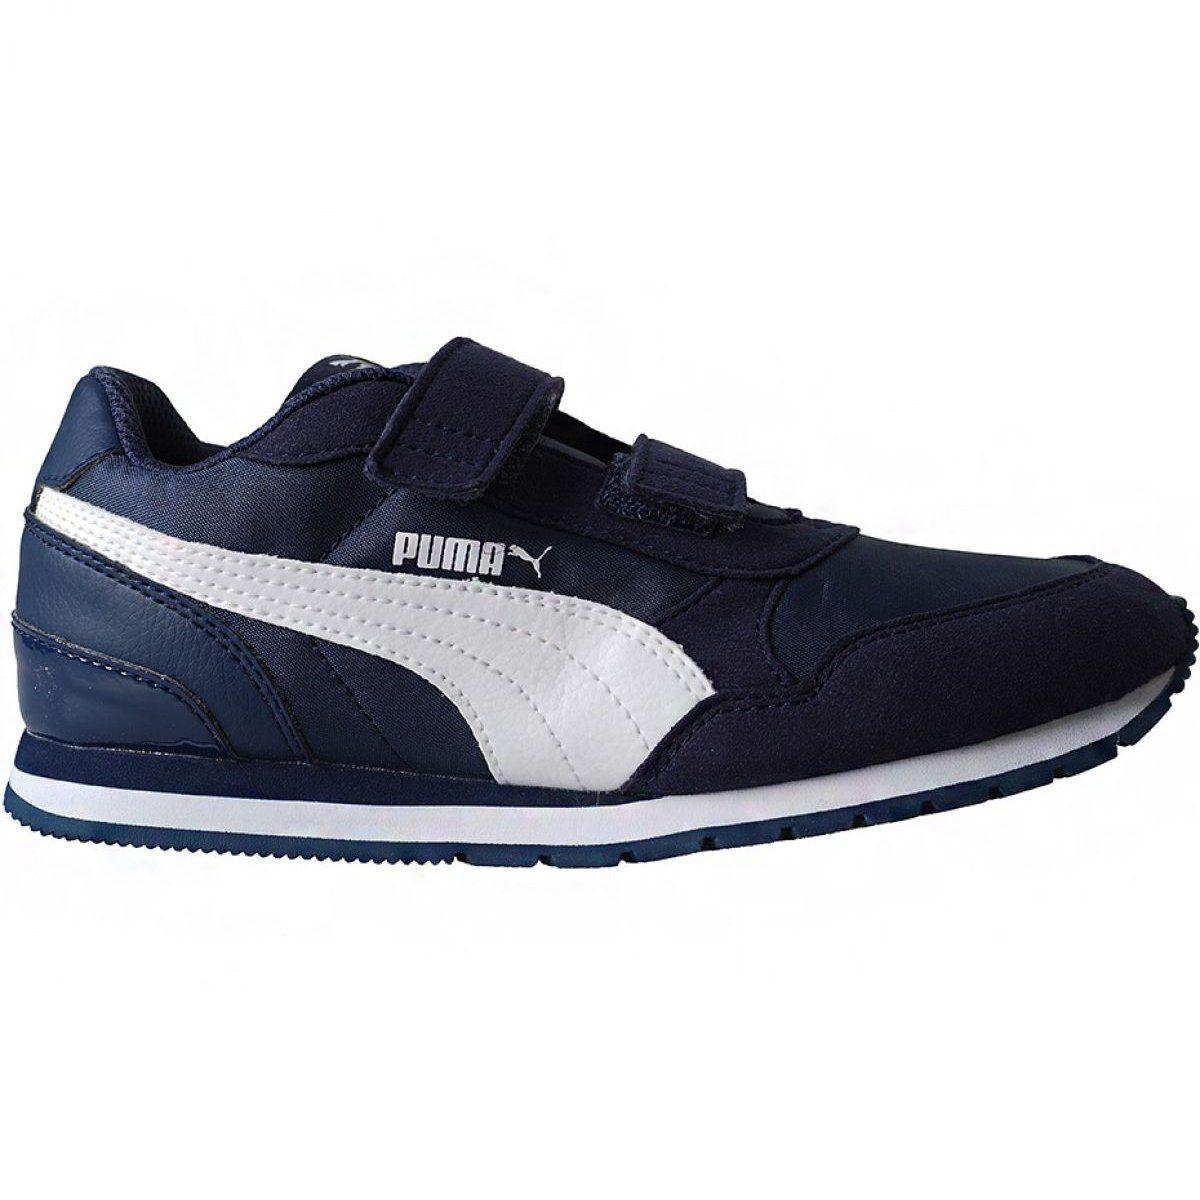 Buty Puma St Runner V2 Nl V Ps Jr 365294 09 Granatowe Kid Shoes Everyday Shoes Shoes